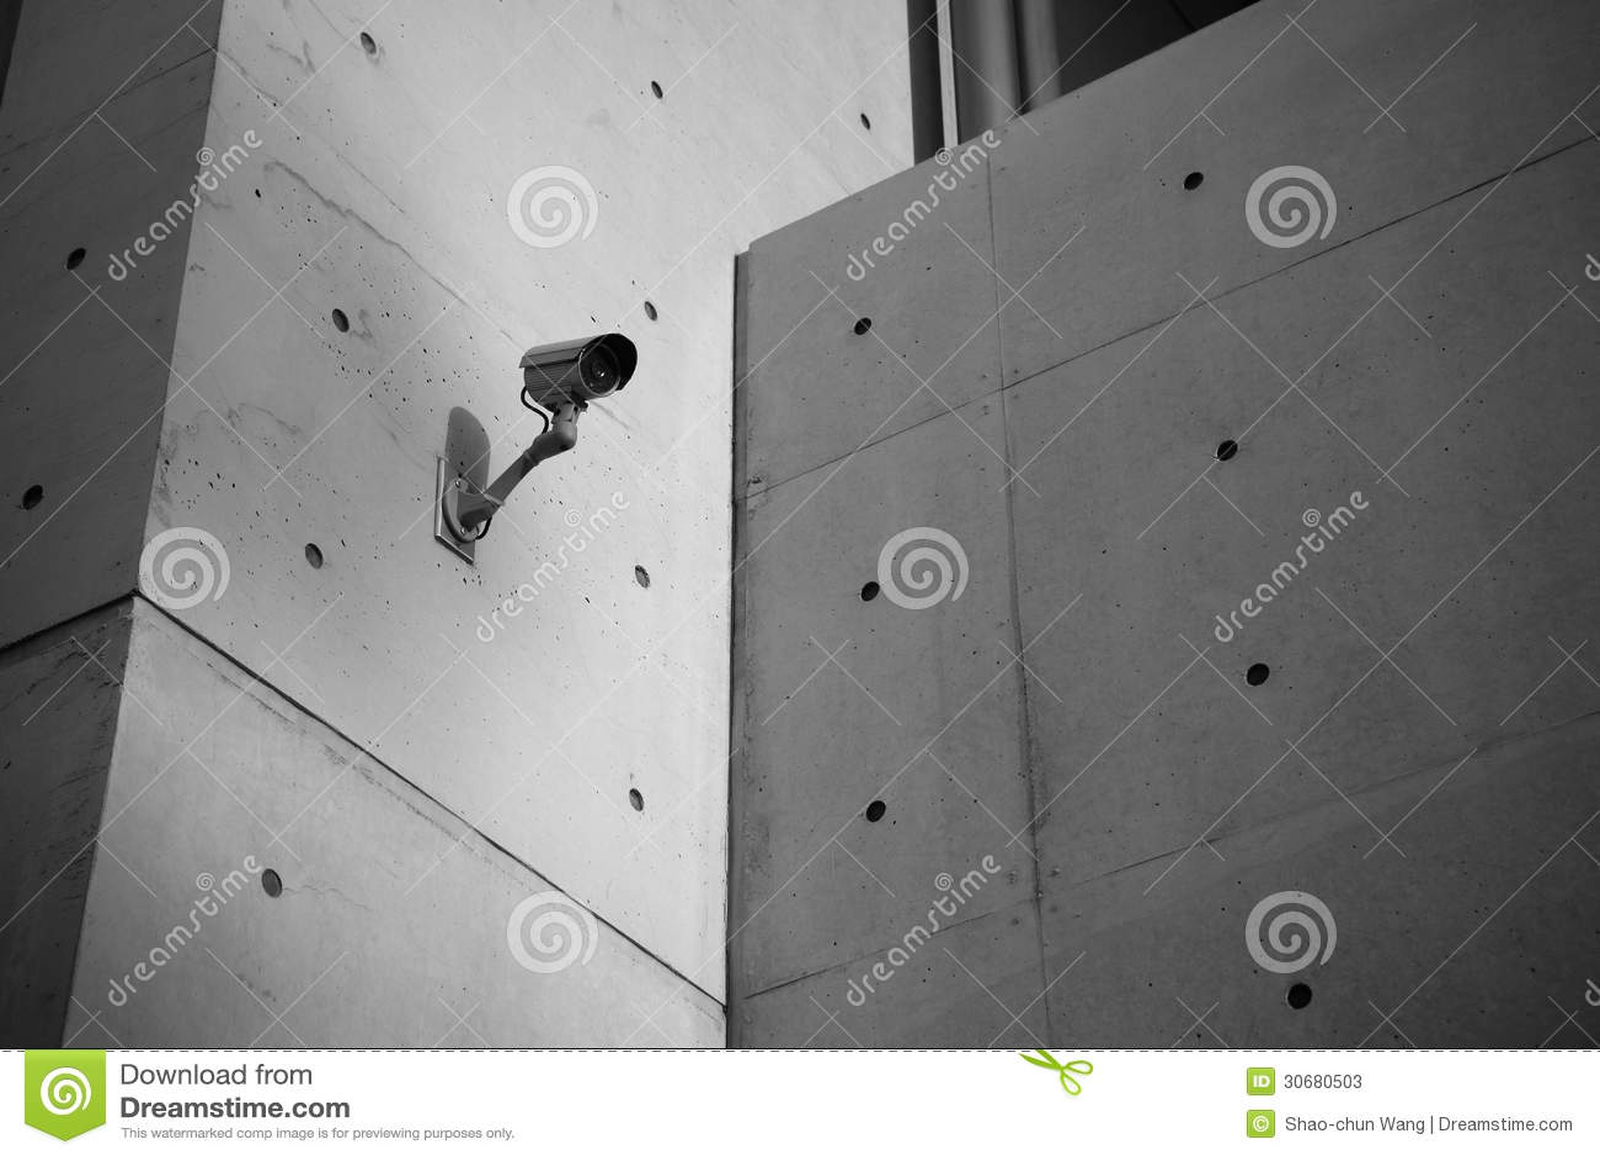 Rock Camera Surveillance : Surveillance security camera with concrete wall stock image image